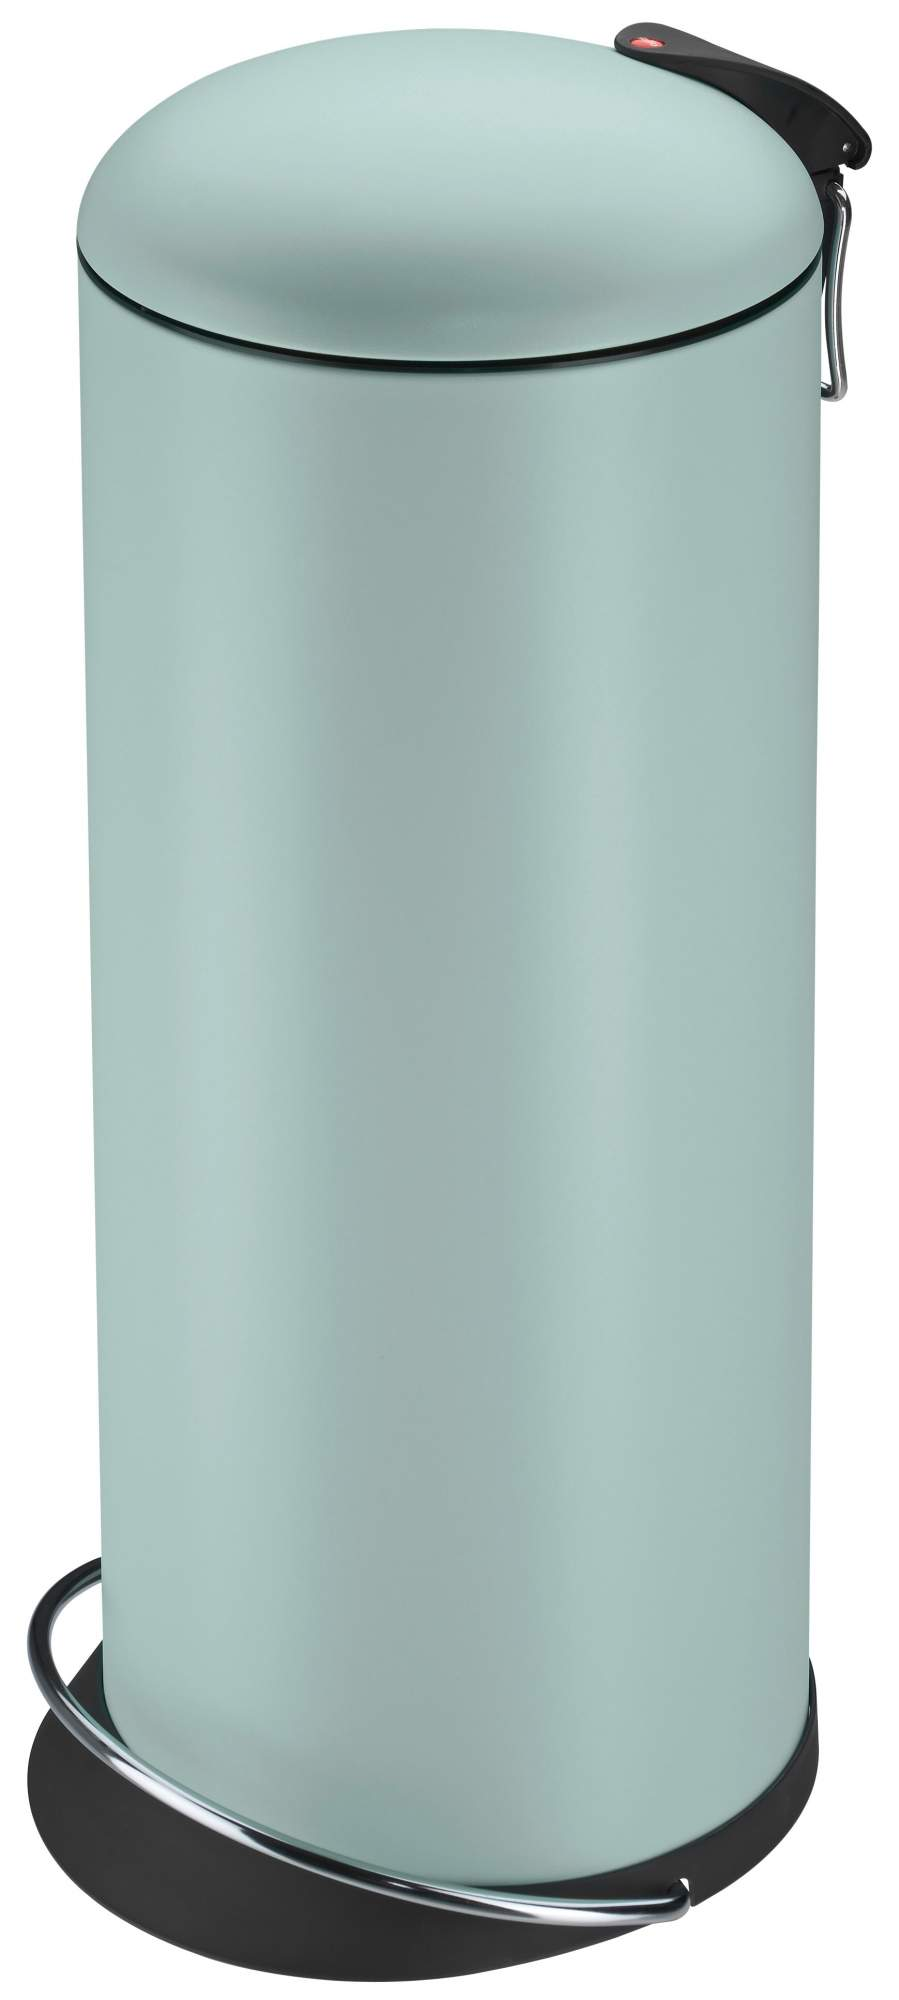 Мусорный контейнер Hailo TOPdesign L, 24л., Мятно-матовый, арт. 0523-080